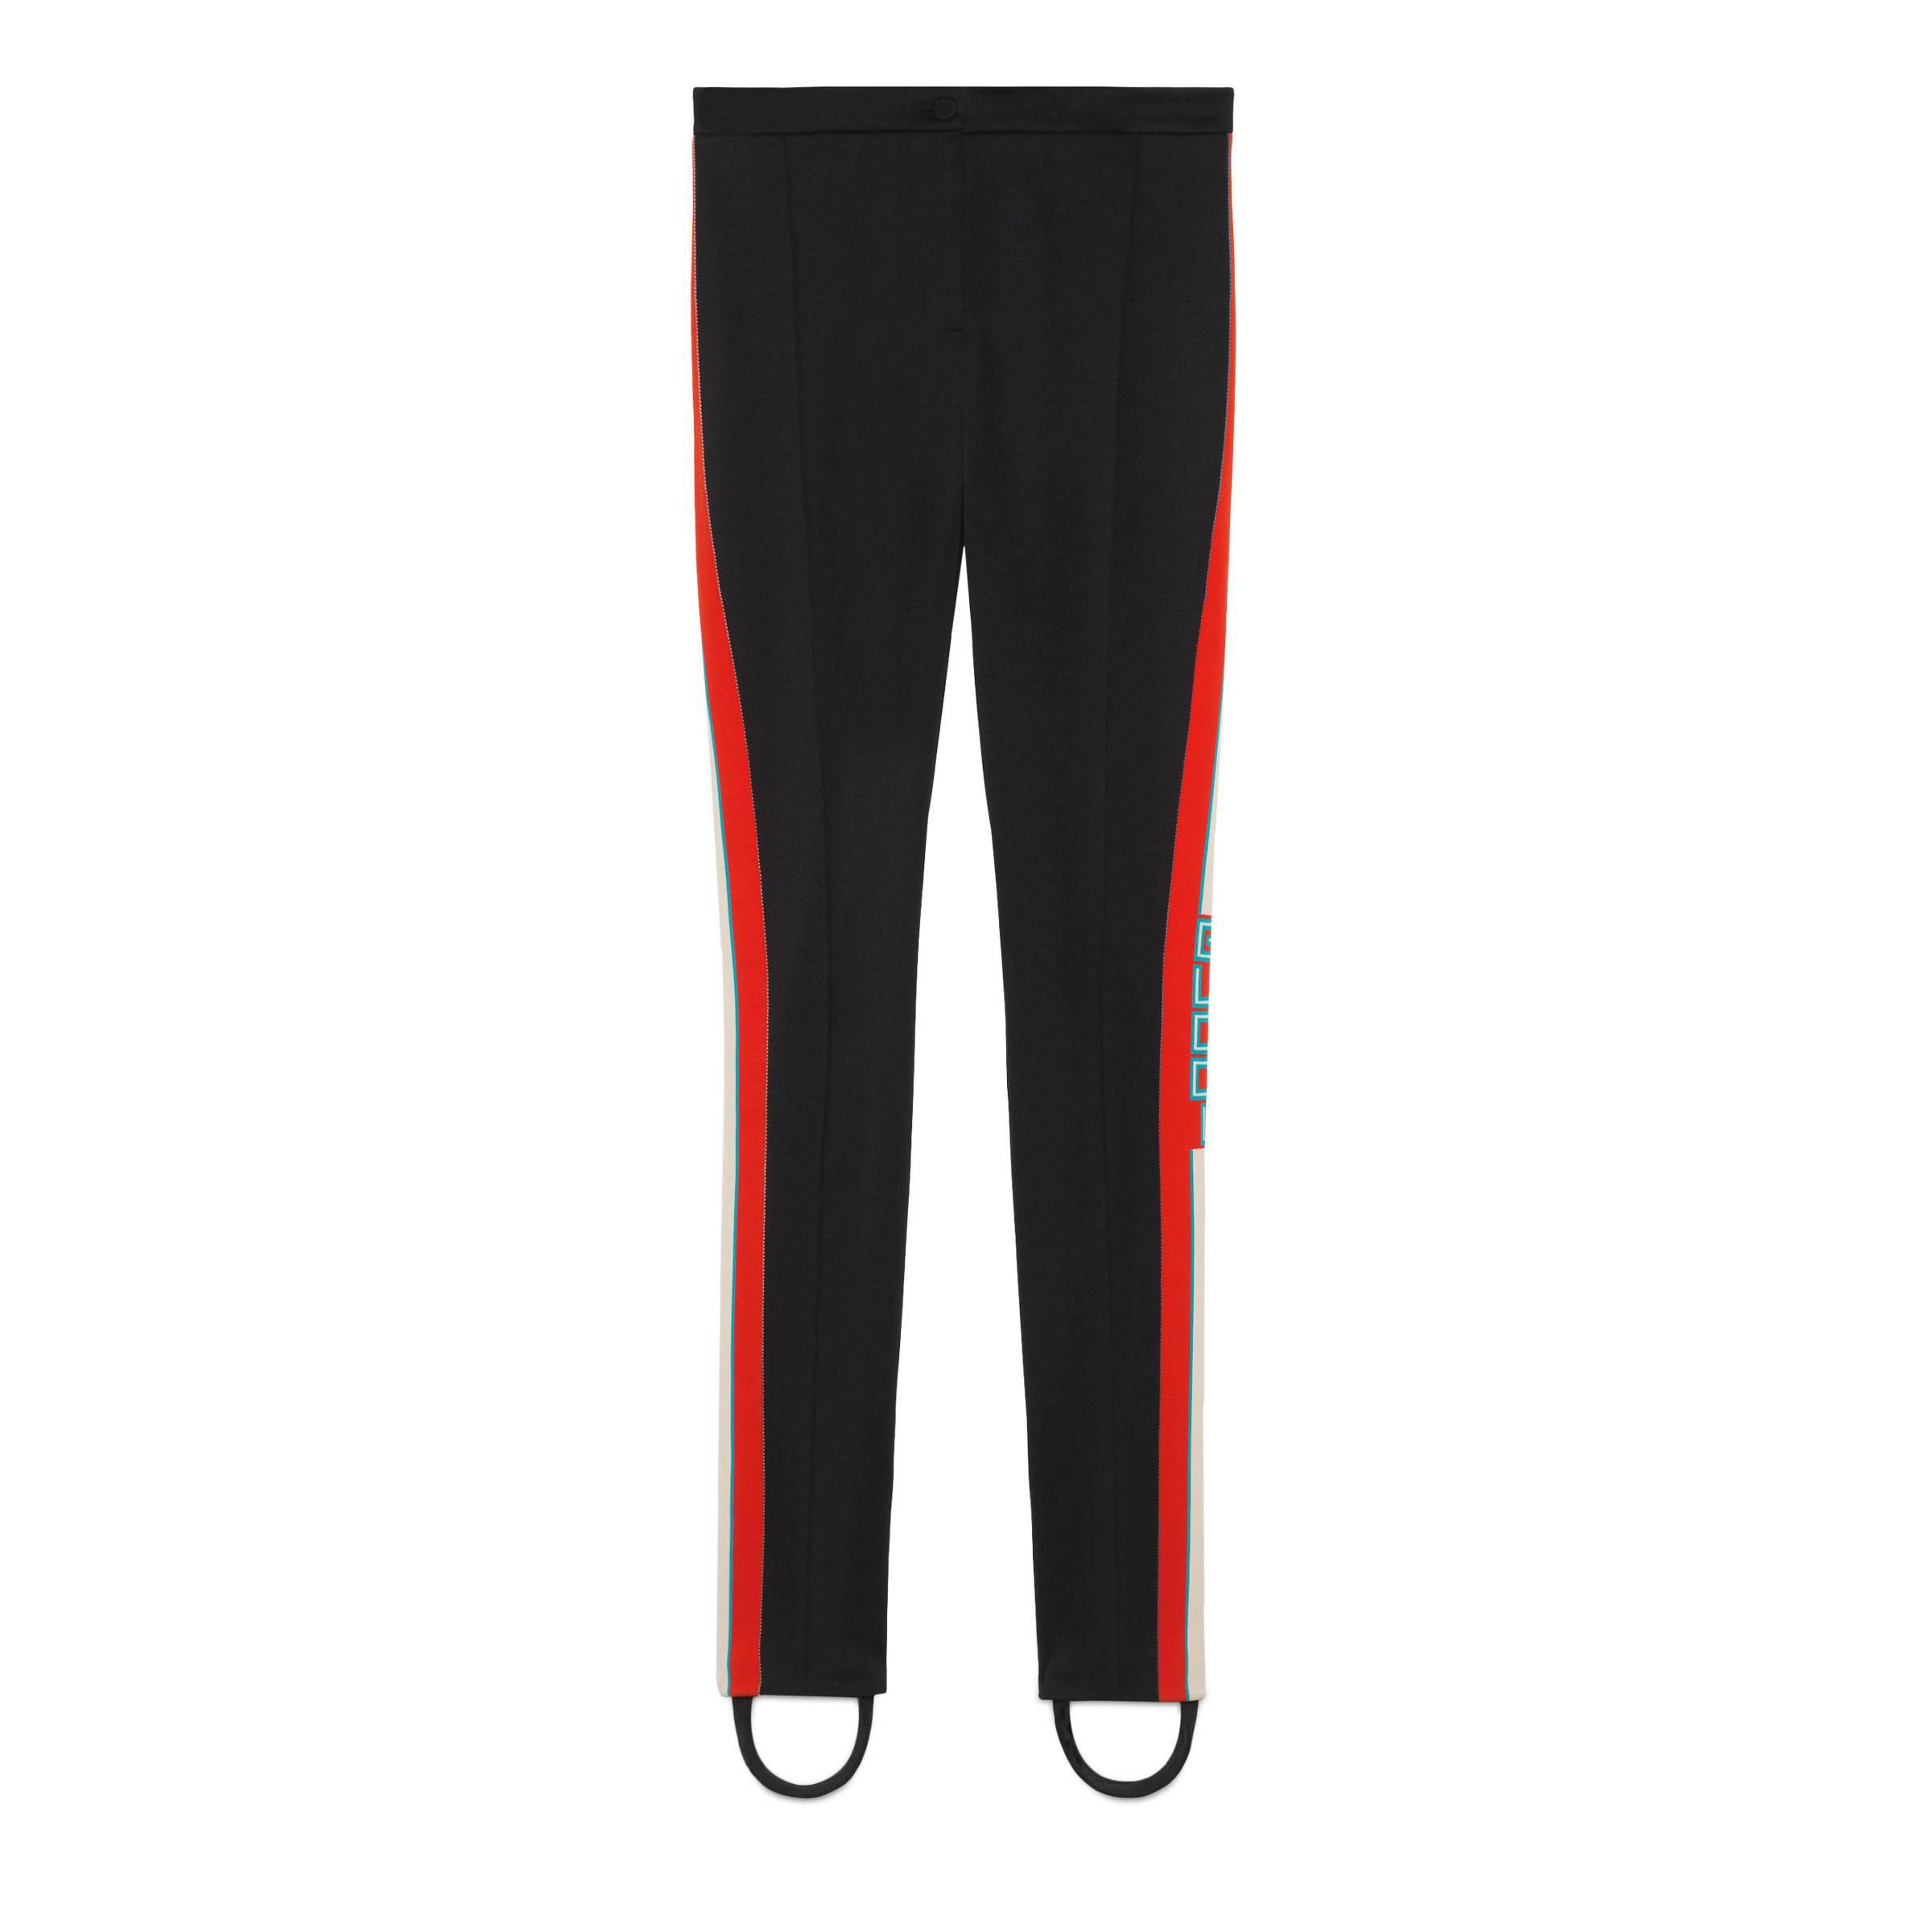 ff91f2843019 Lyst - Gucci Technical Jersey Stirrup Leggings in Black